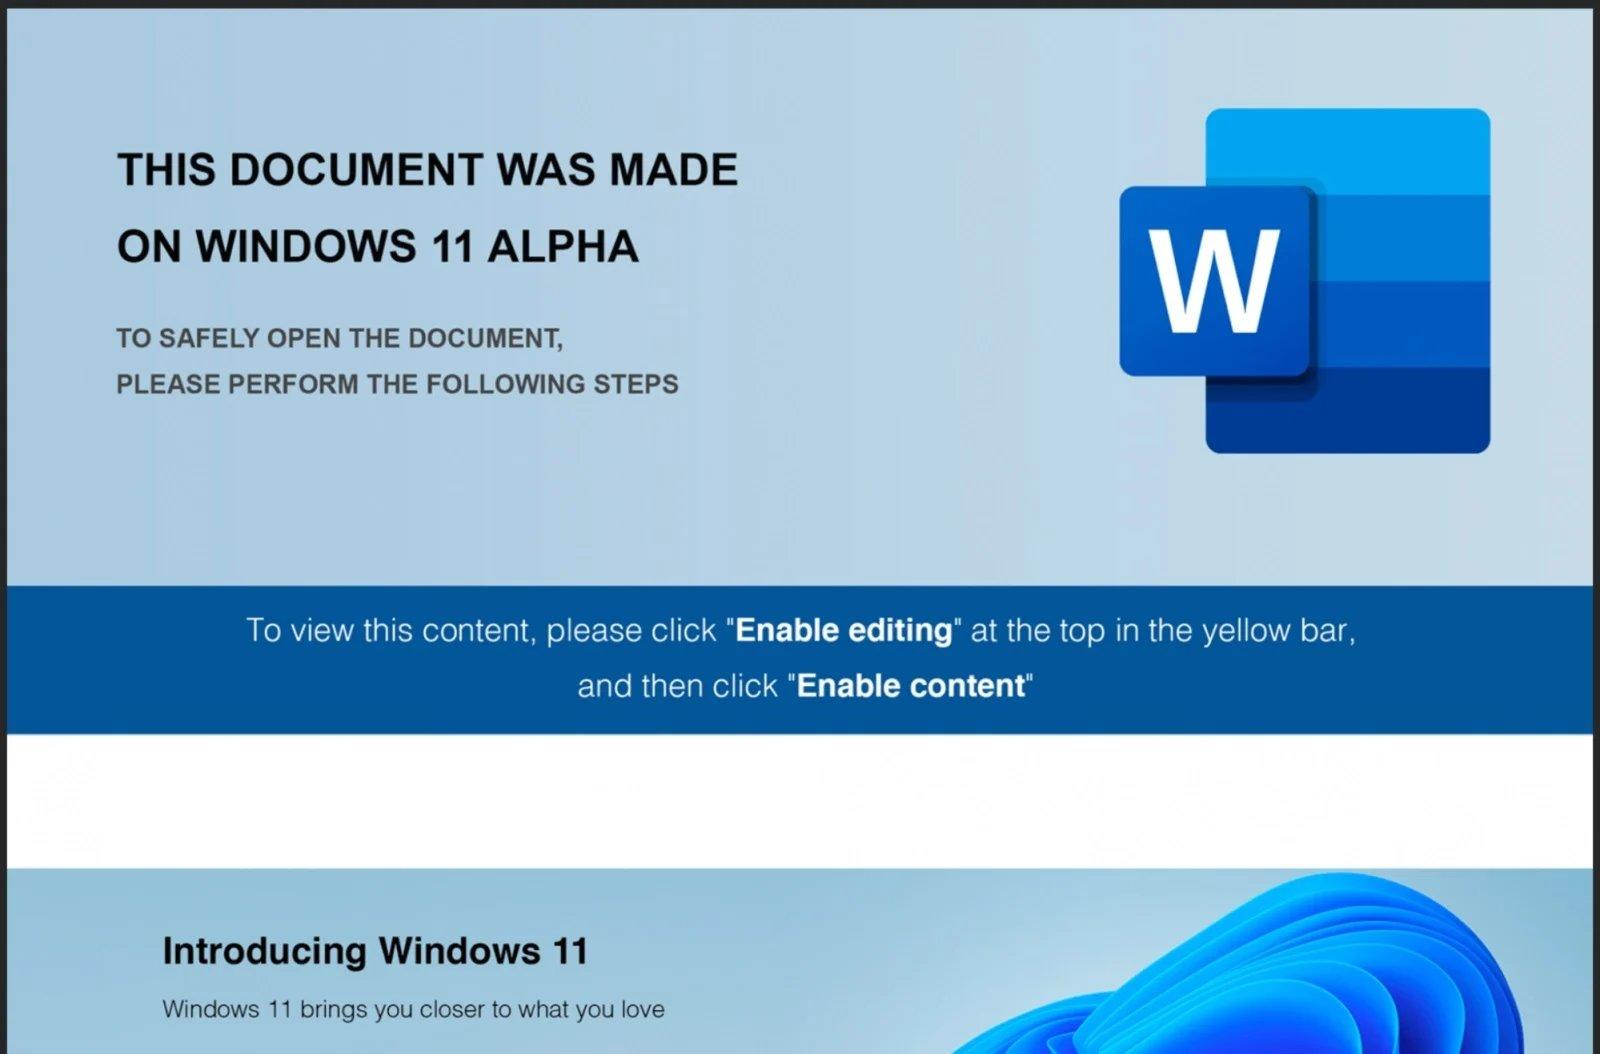 Windows 11 Alpha malware